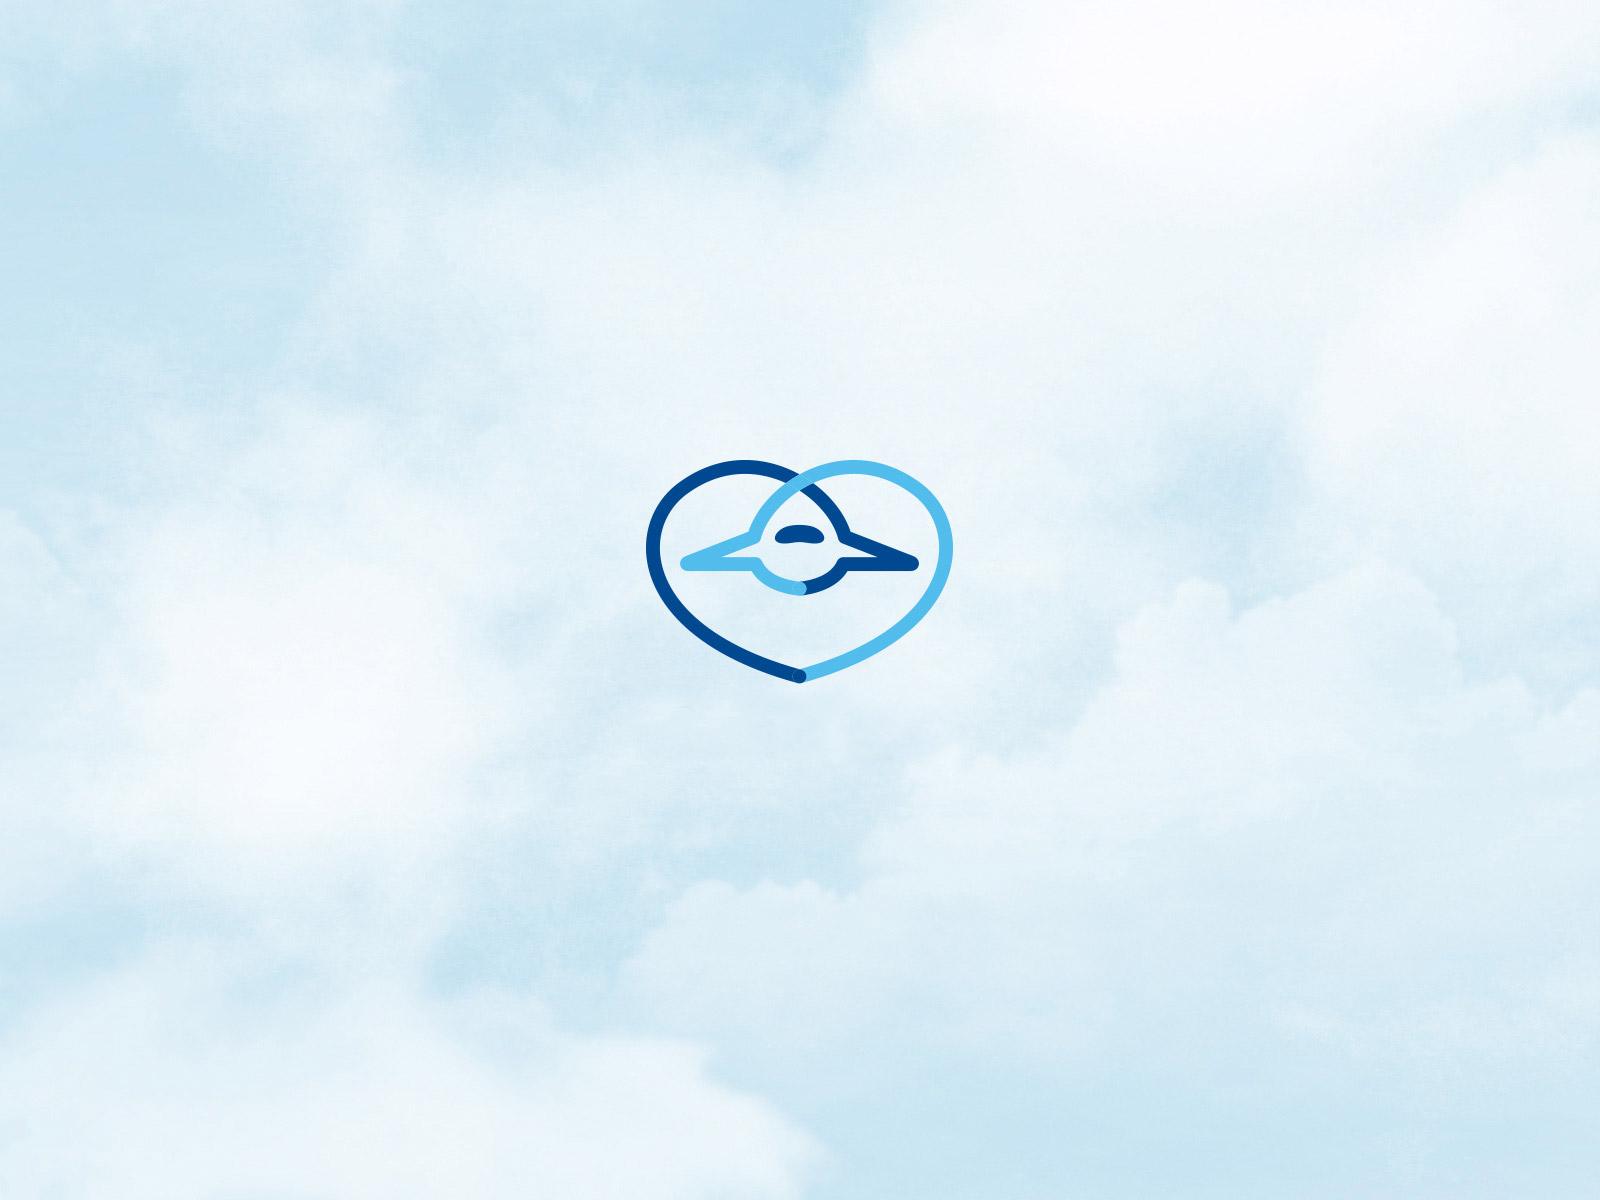 Sky Of Love icon